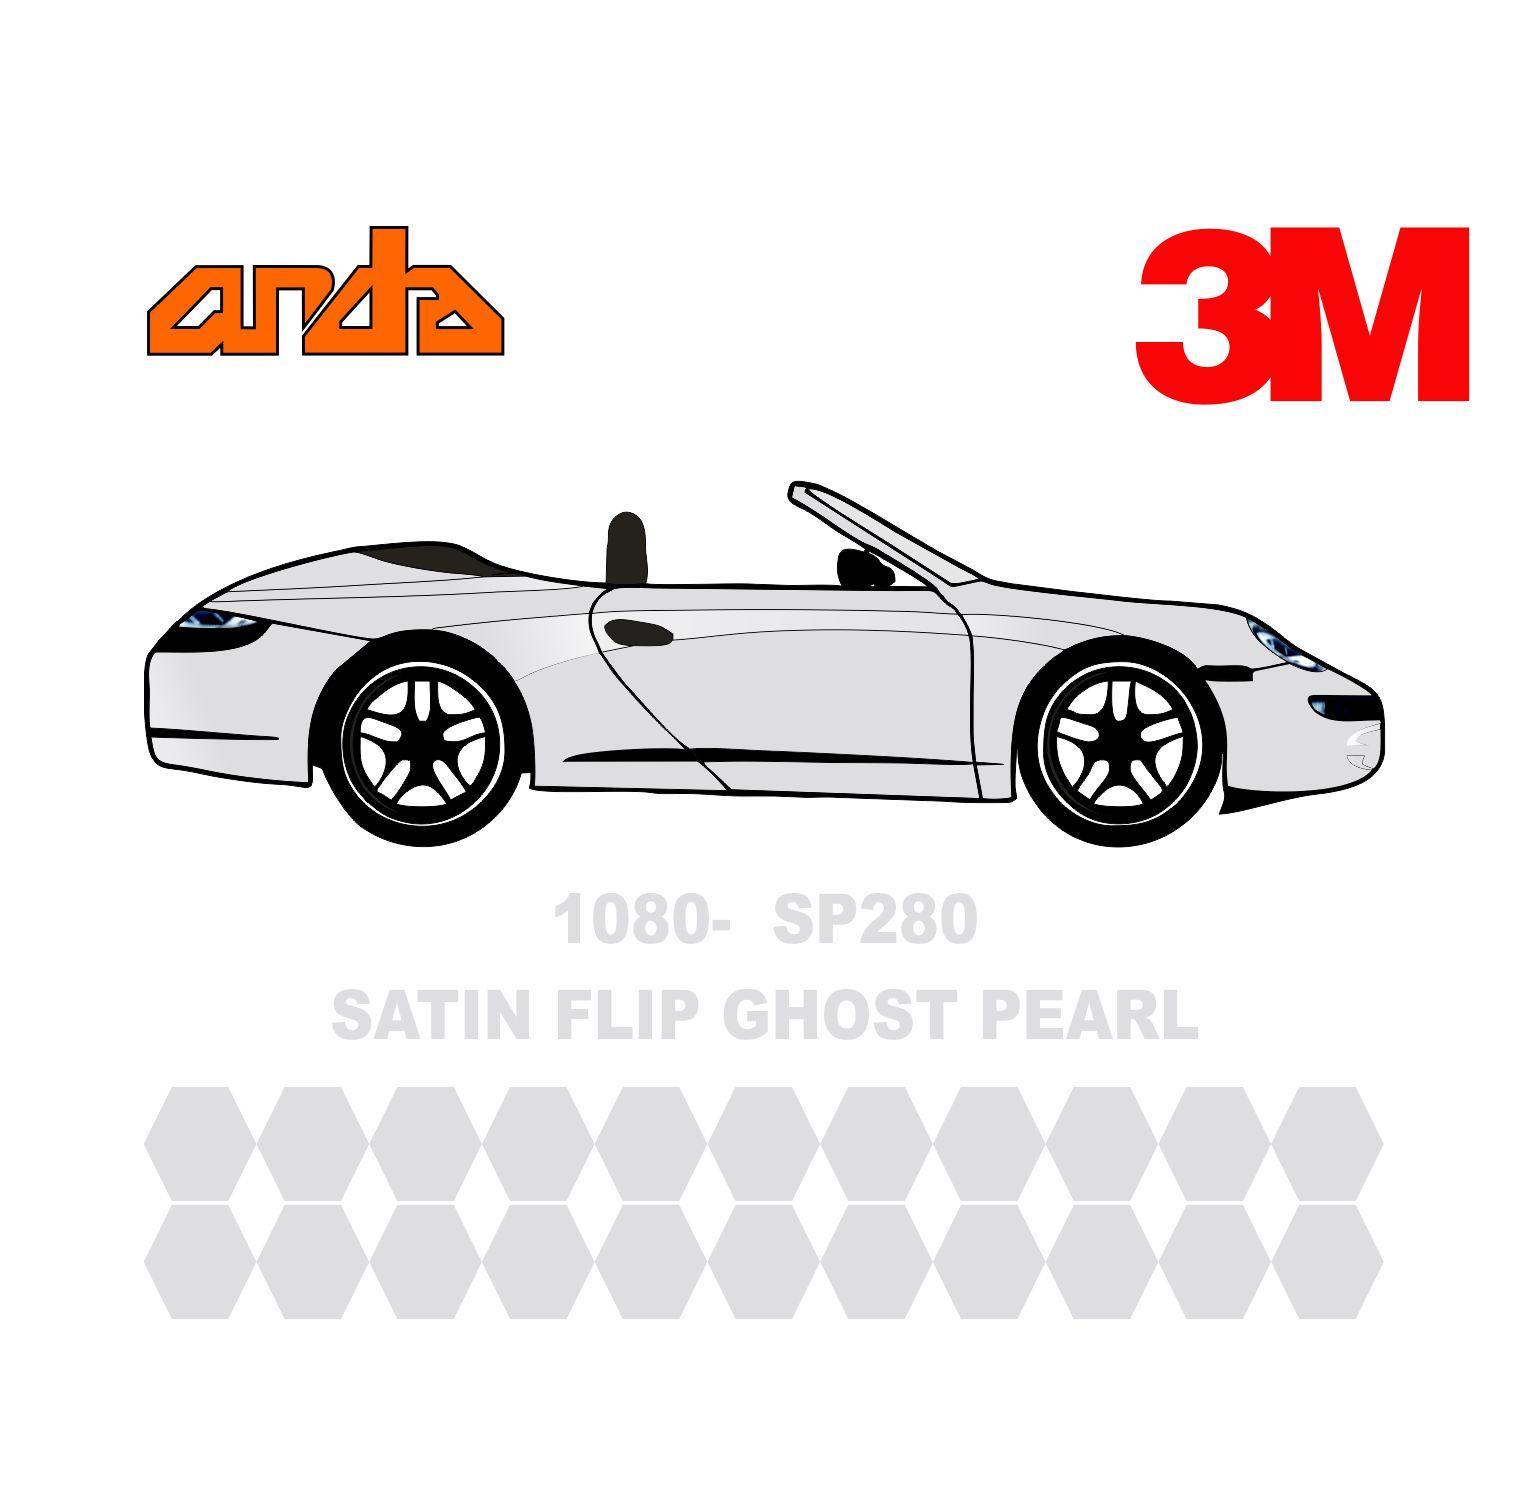 3M 1080-SP280 Satin Flip Ghost Pearl 1